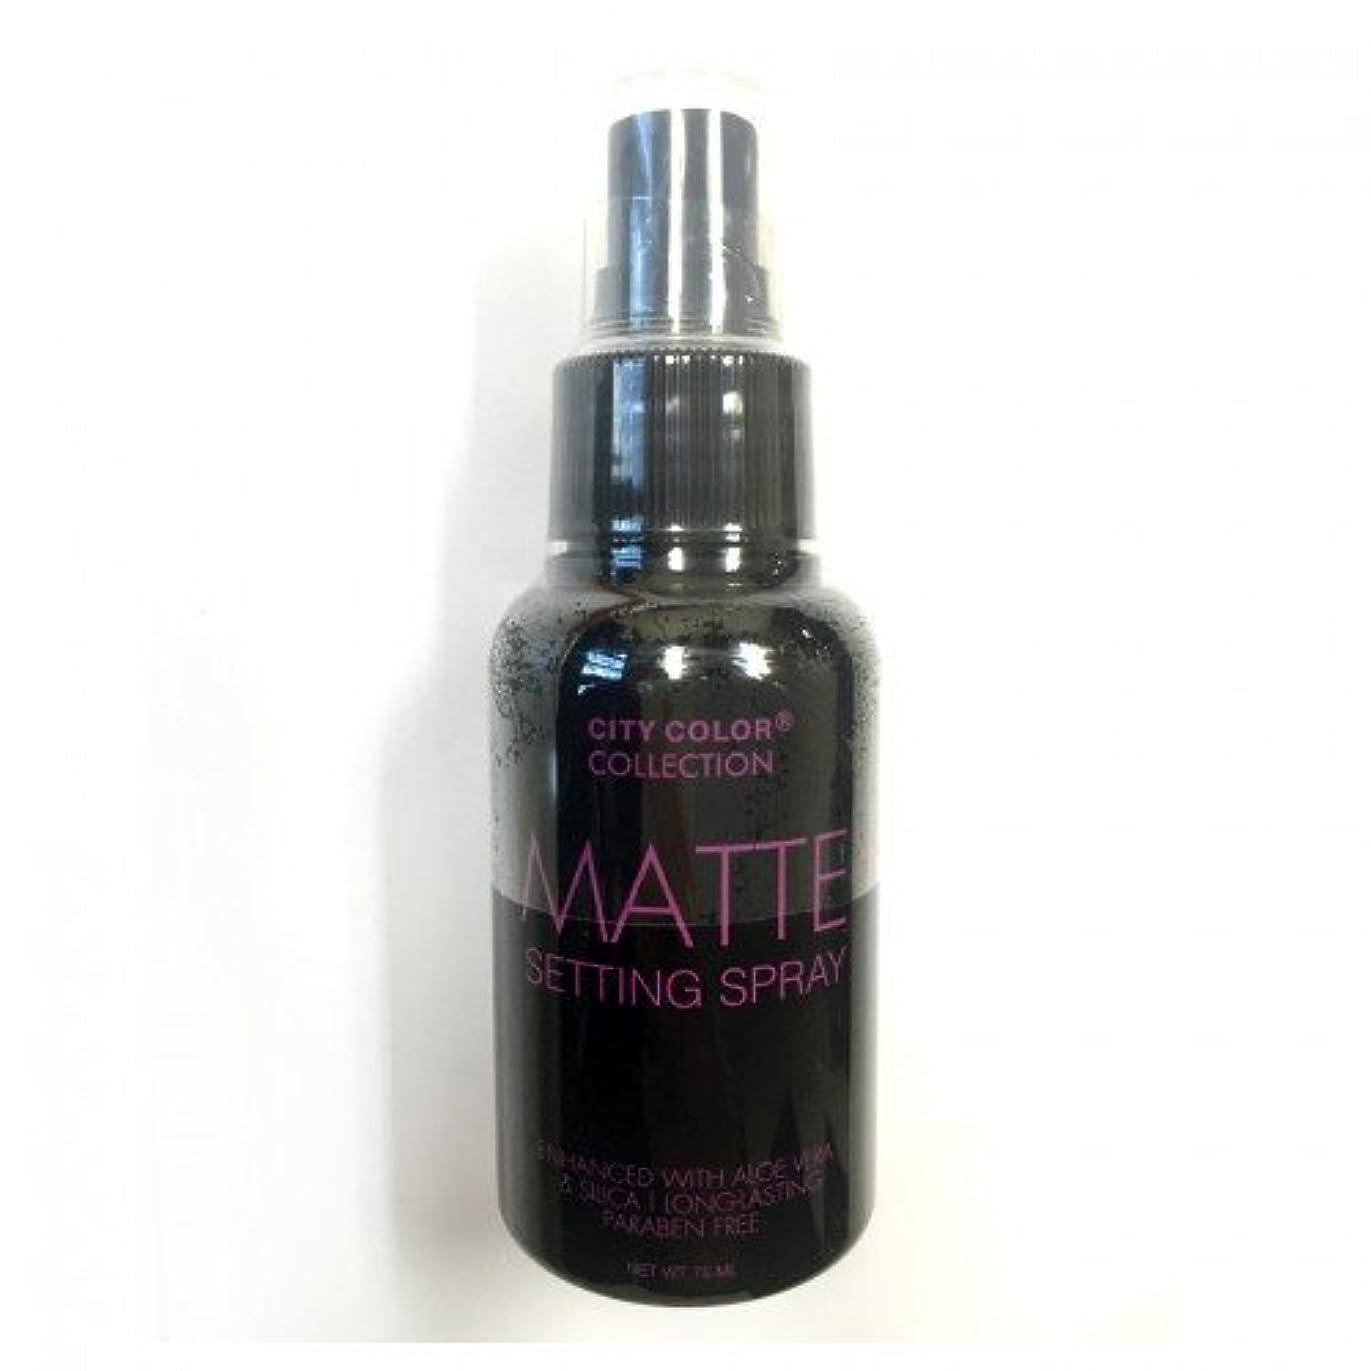 用語集歴史的文字通り(3 Pack) CITY COLOR Matte Setting Spray (並行輸入品)